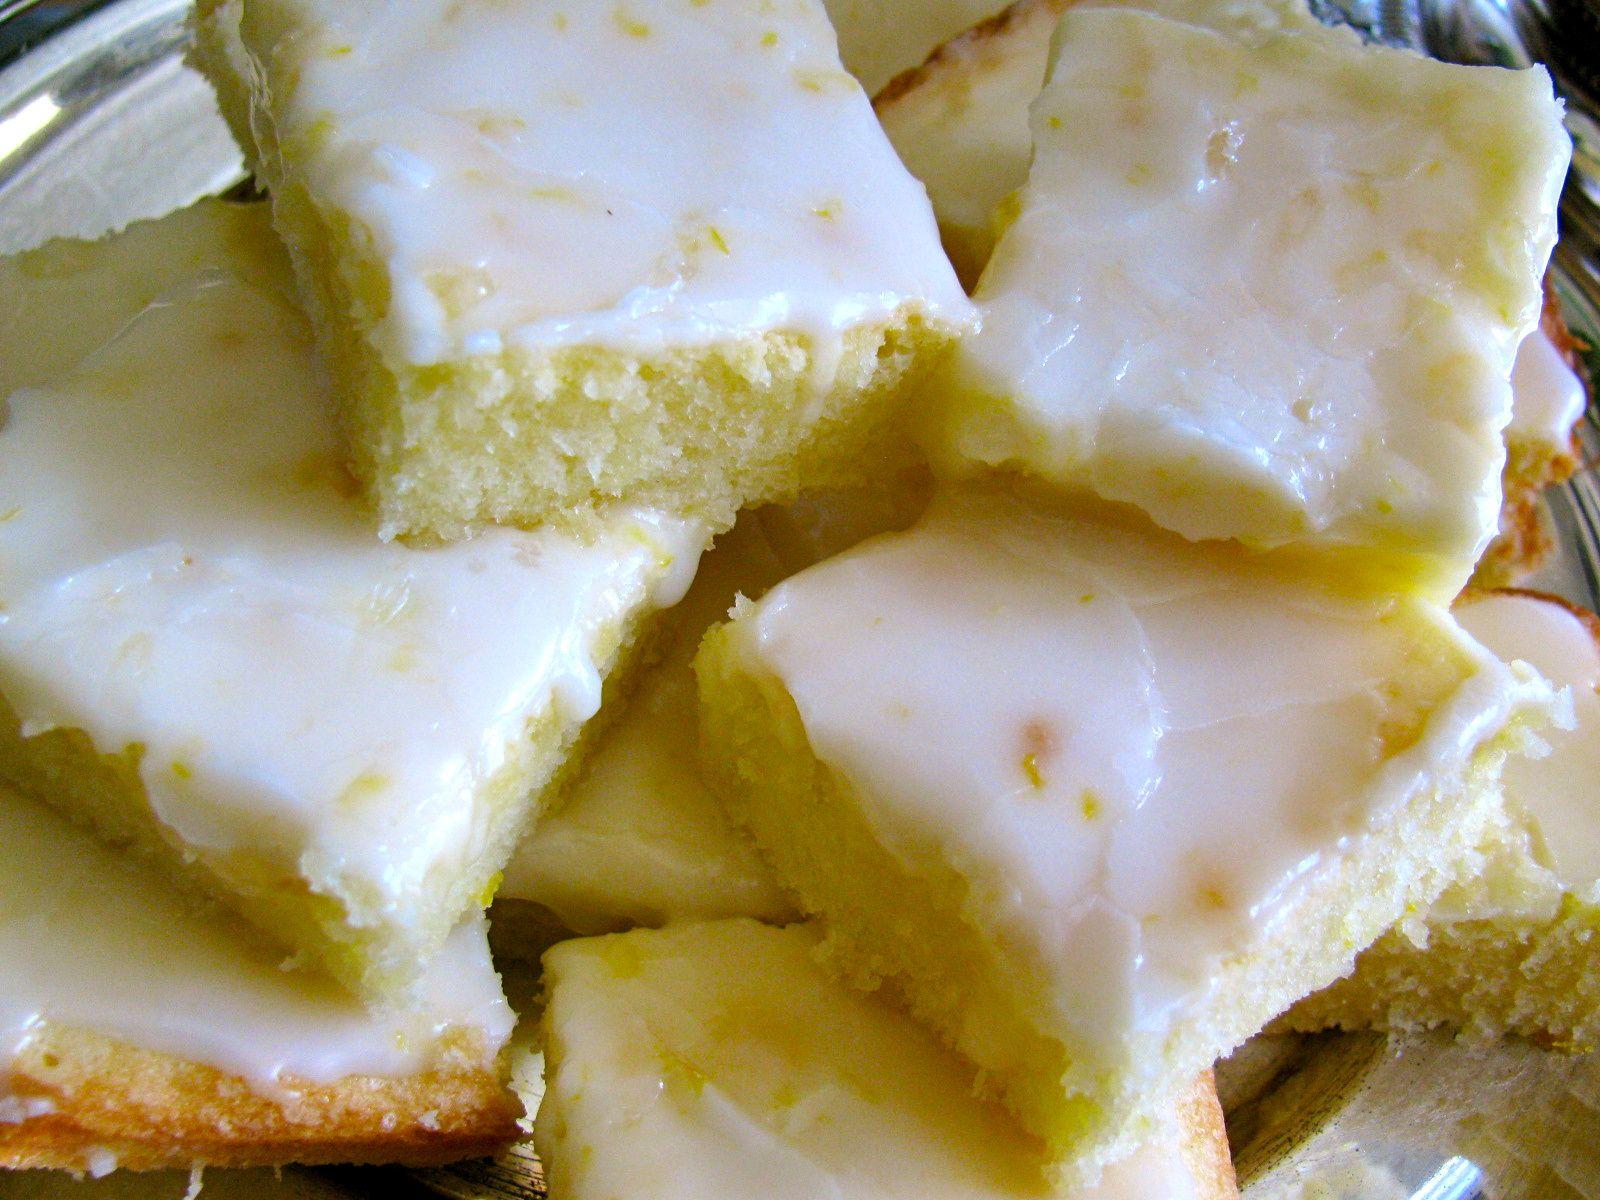 Tasty Treat Tuesday: Lemon Brownies